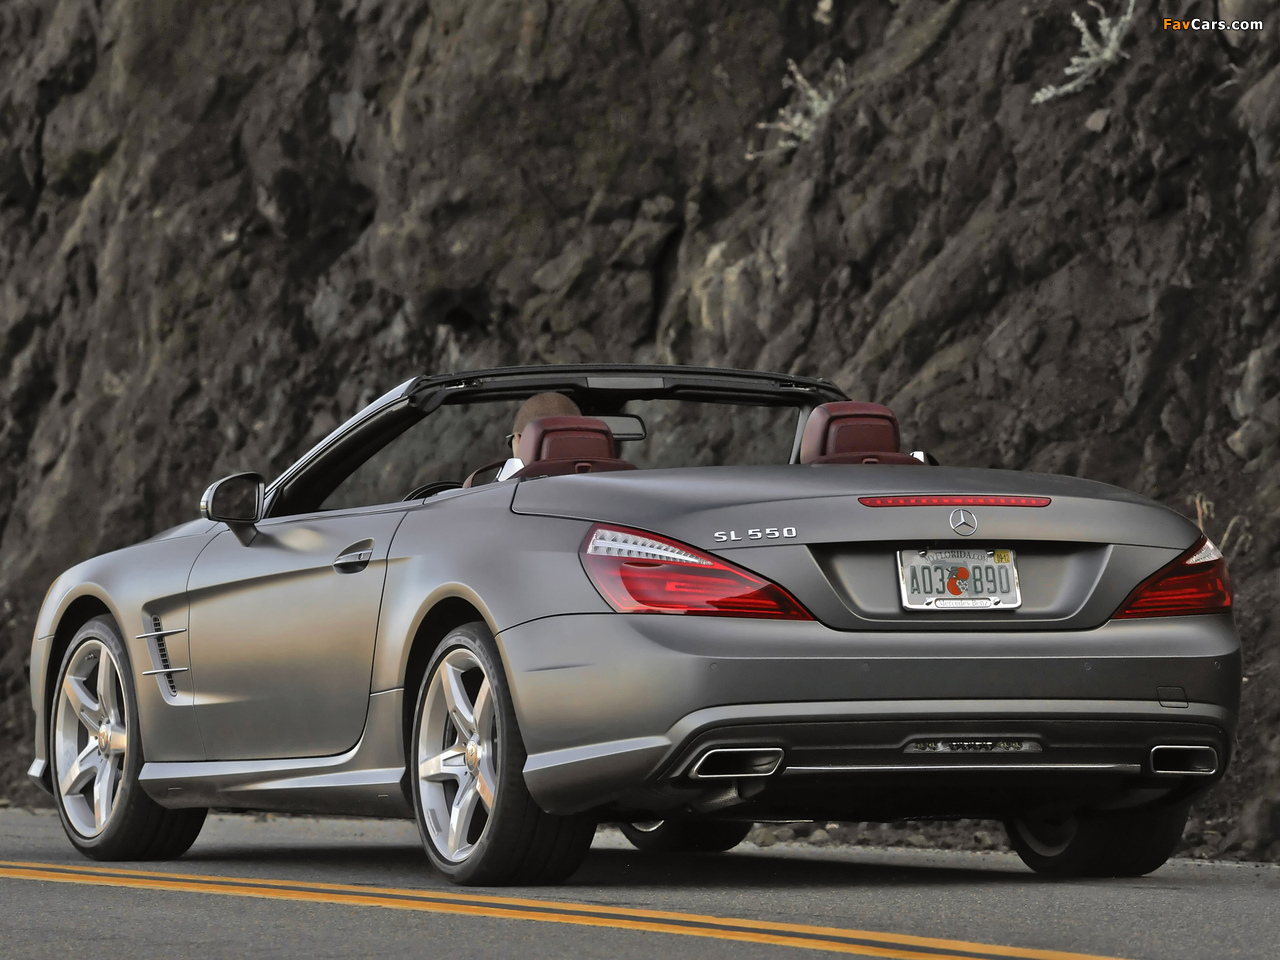 Mercedes-Benz SL 550 AMG Sports Package (R231) 2012 photos (1280 x 960)